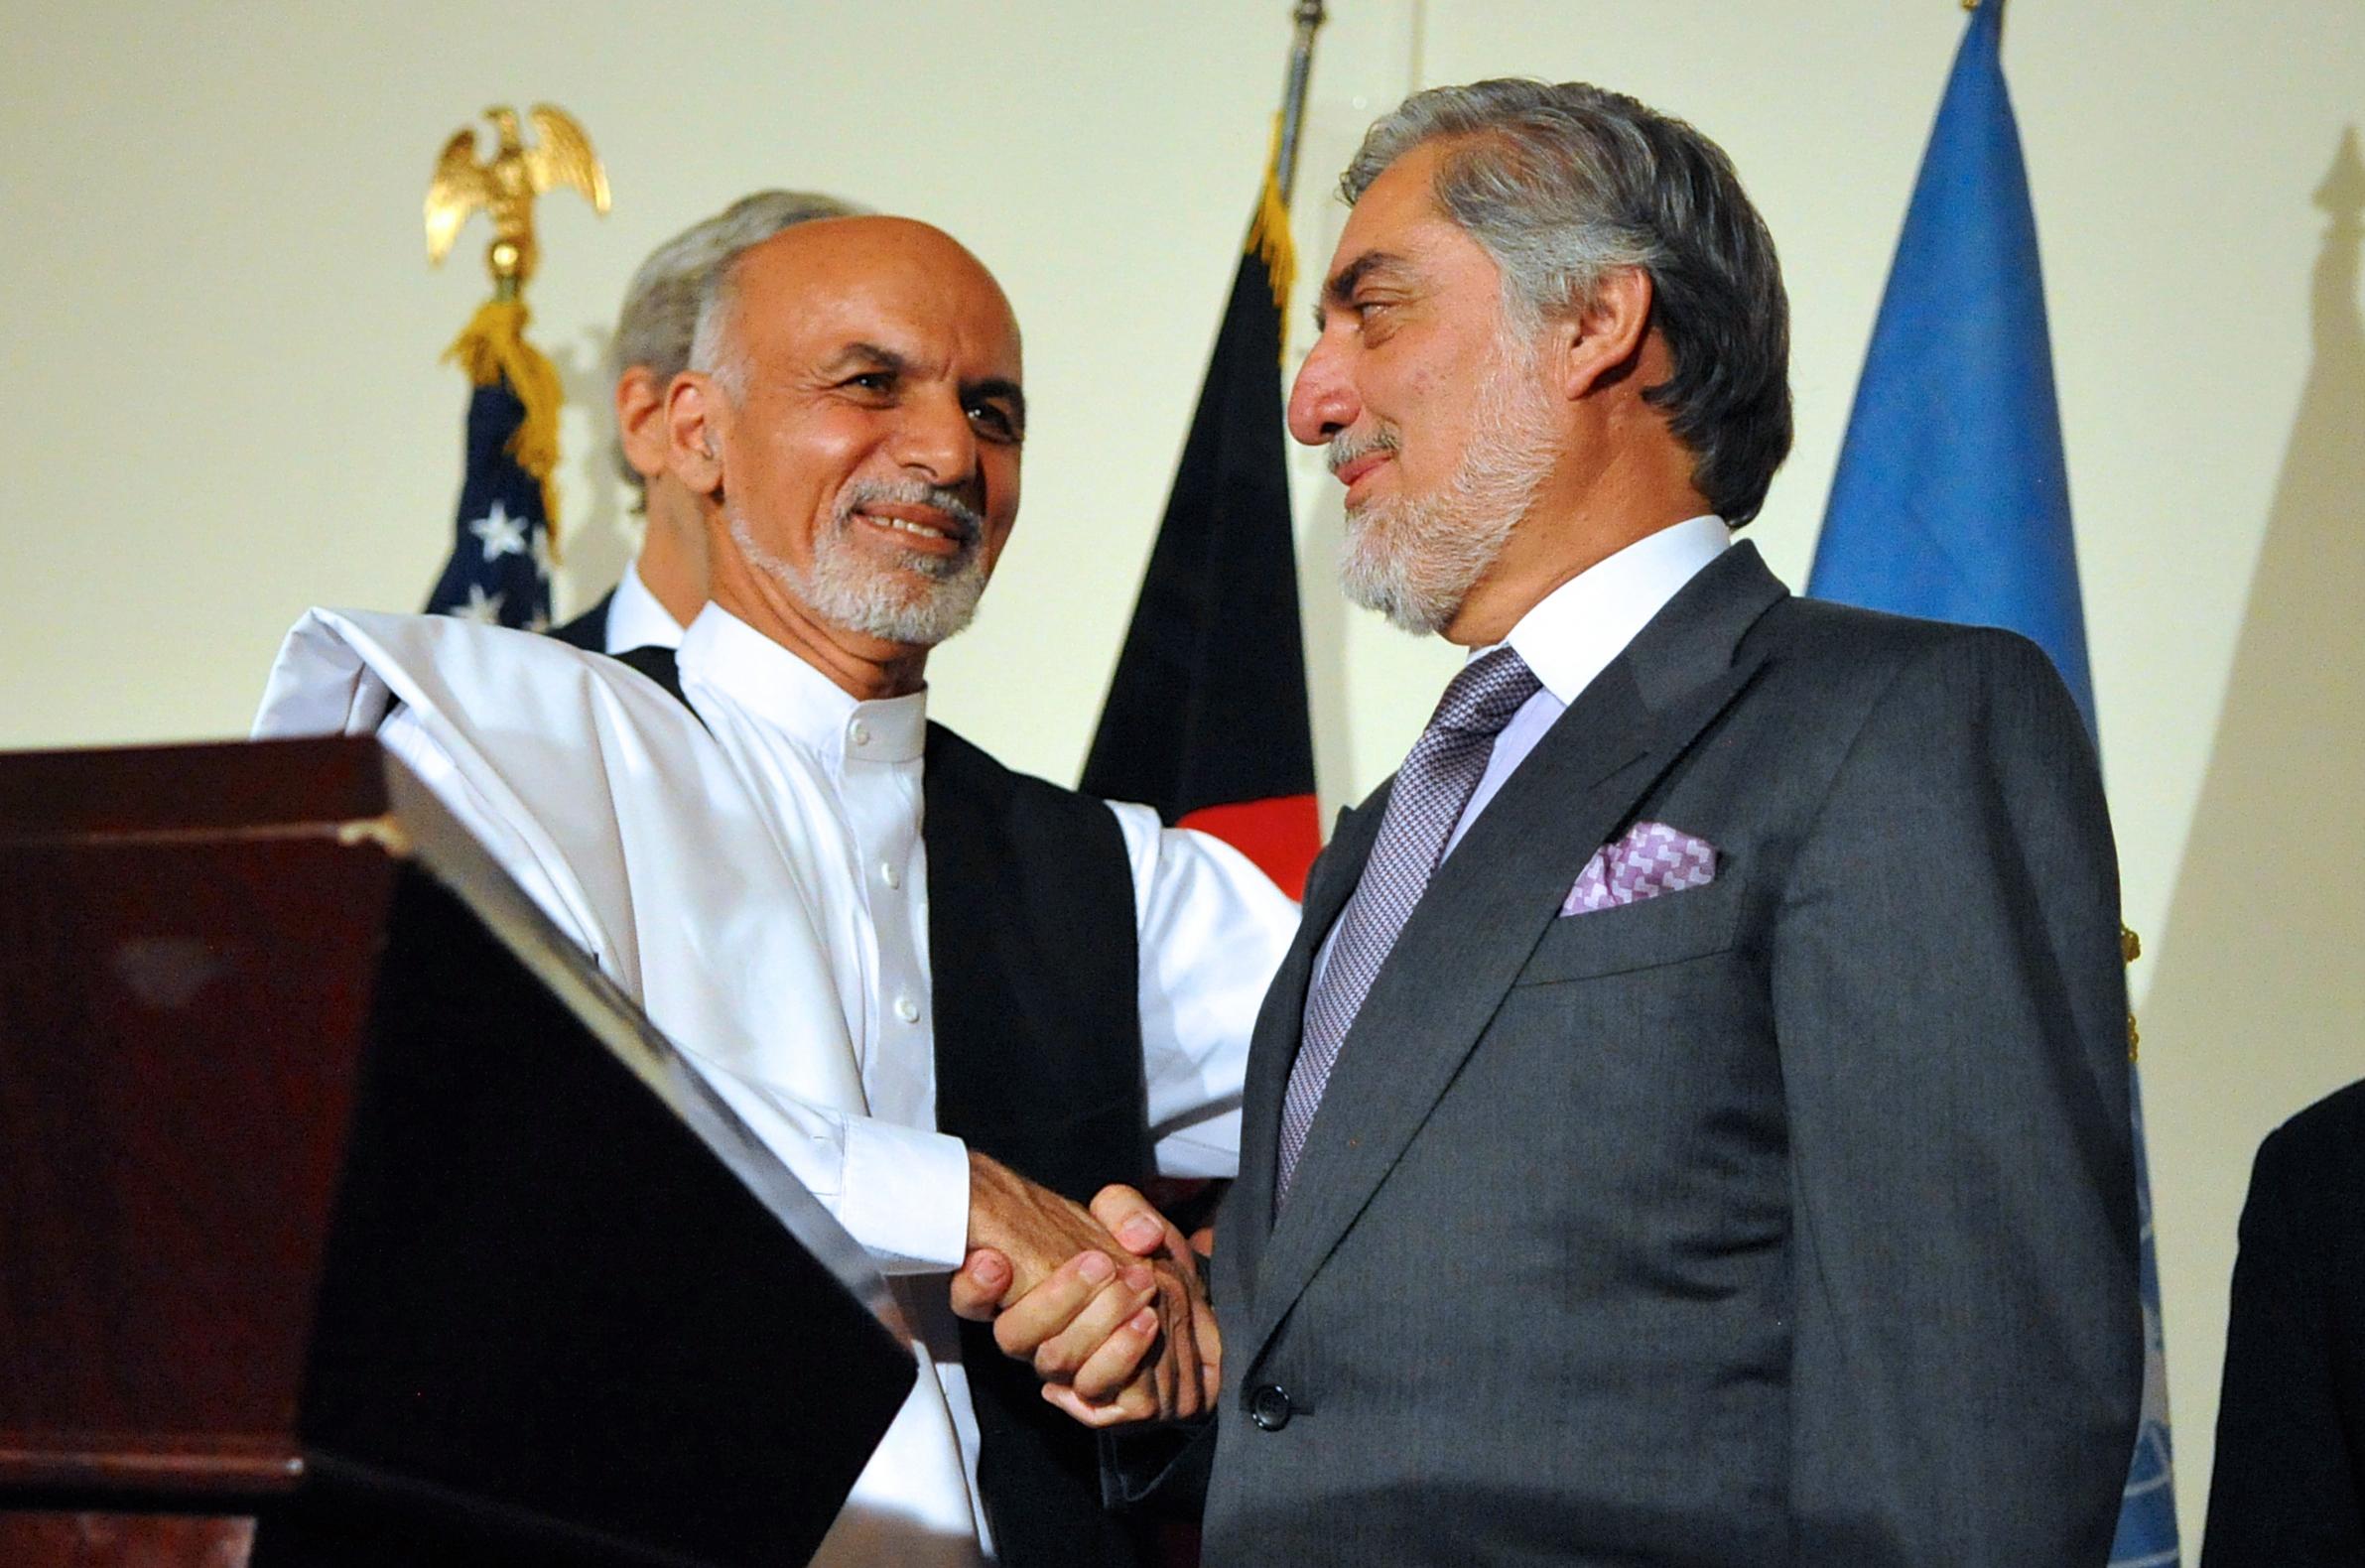 ashraf_ghani_shakes_hands_with_abdullah_abdullah